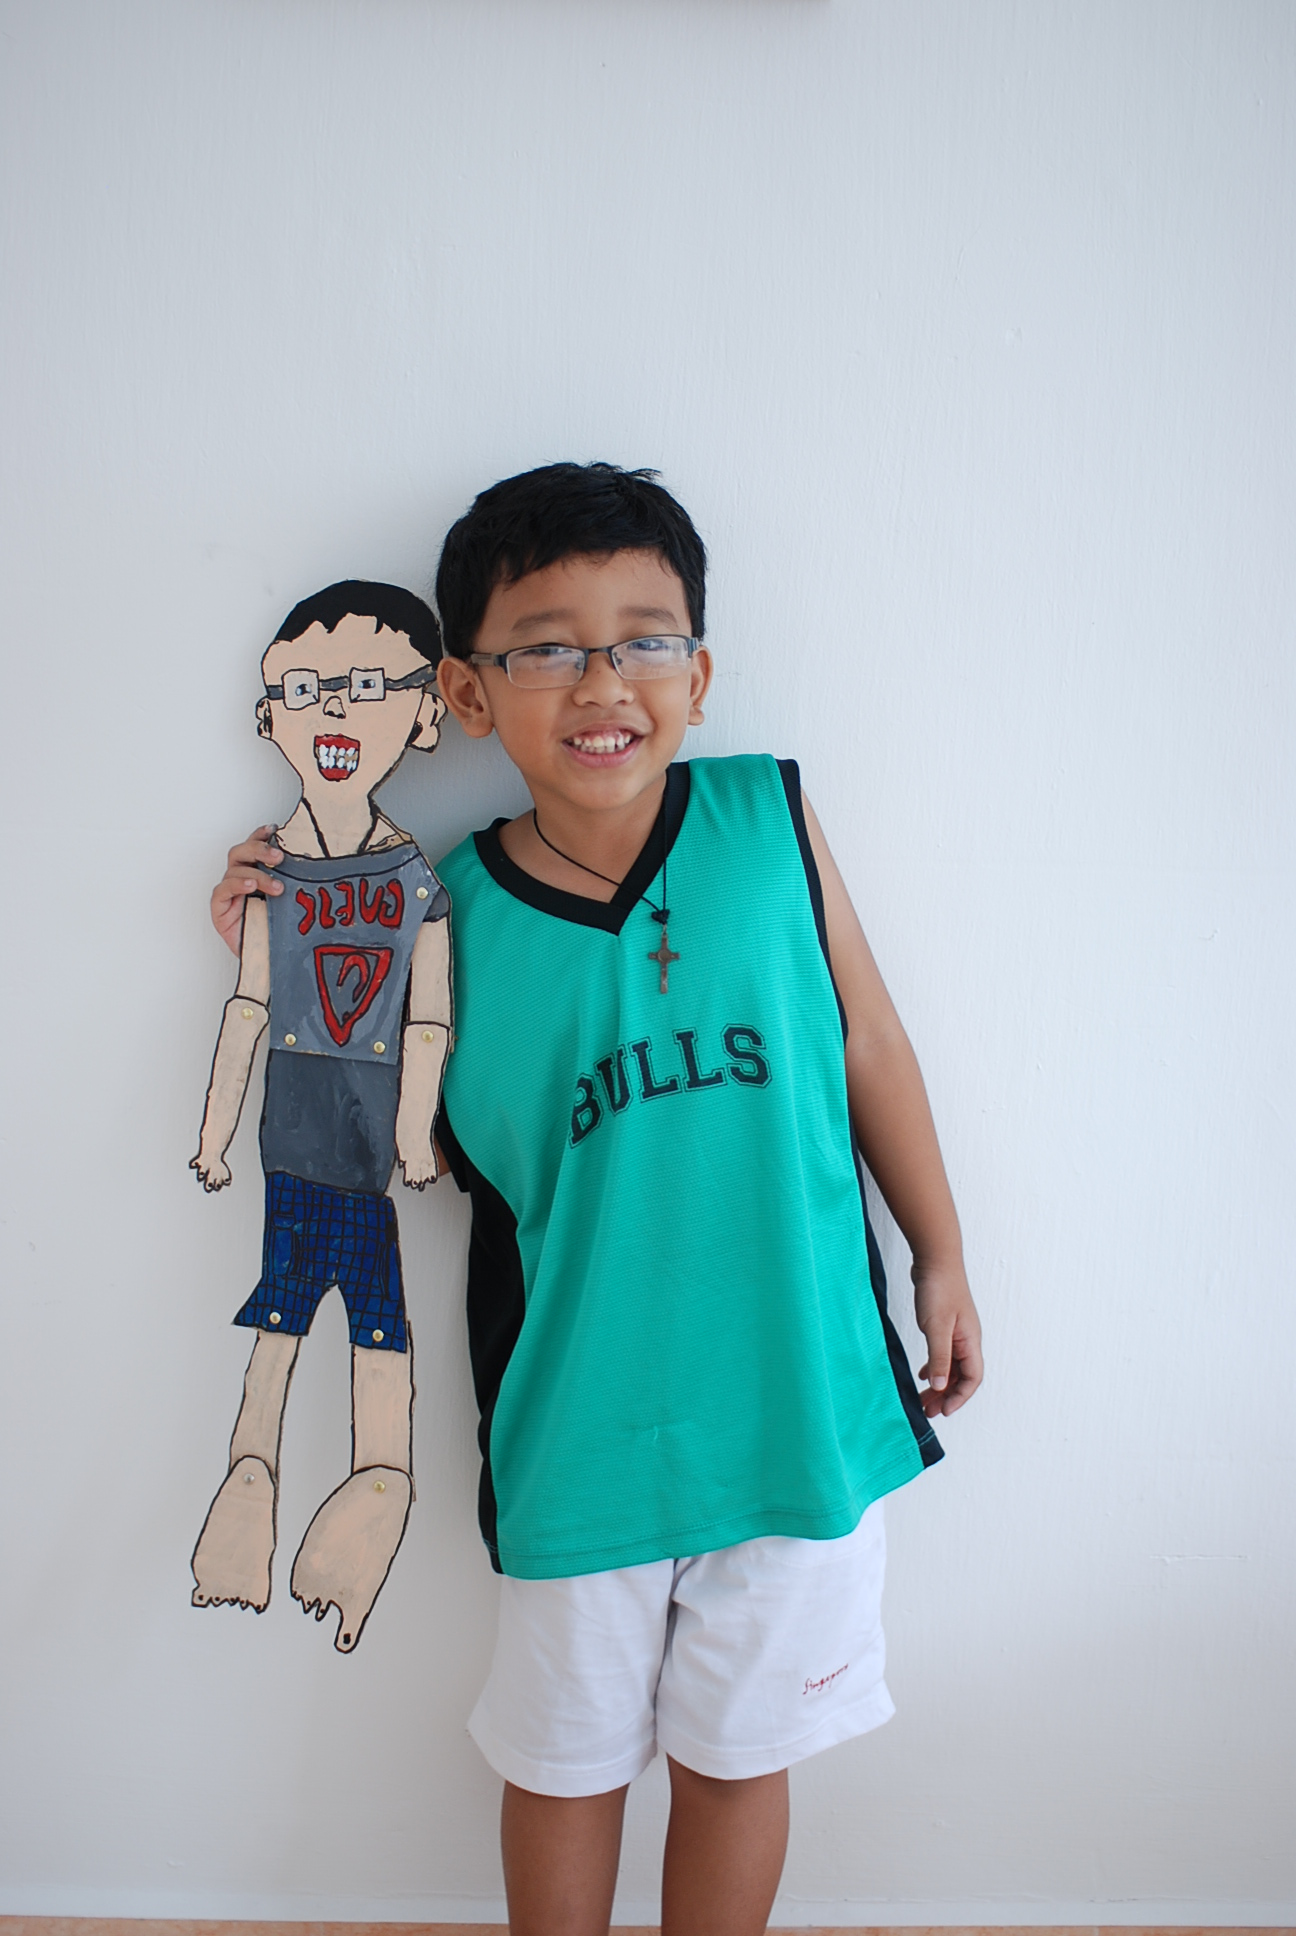 Christian-6-Cardboard doll.JPG